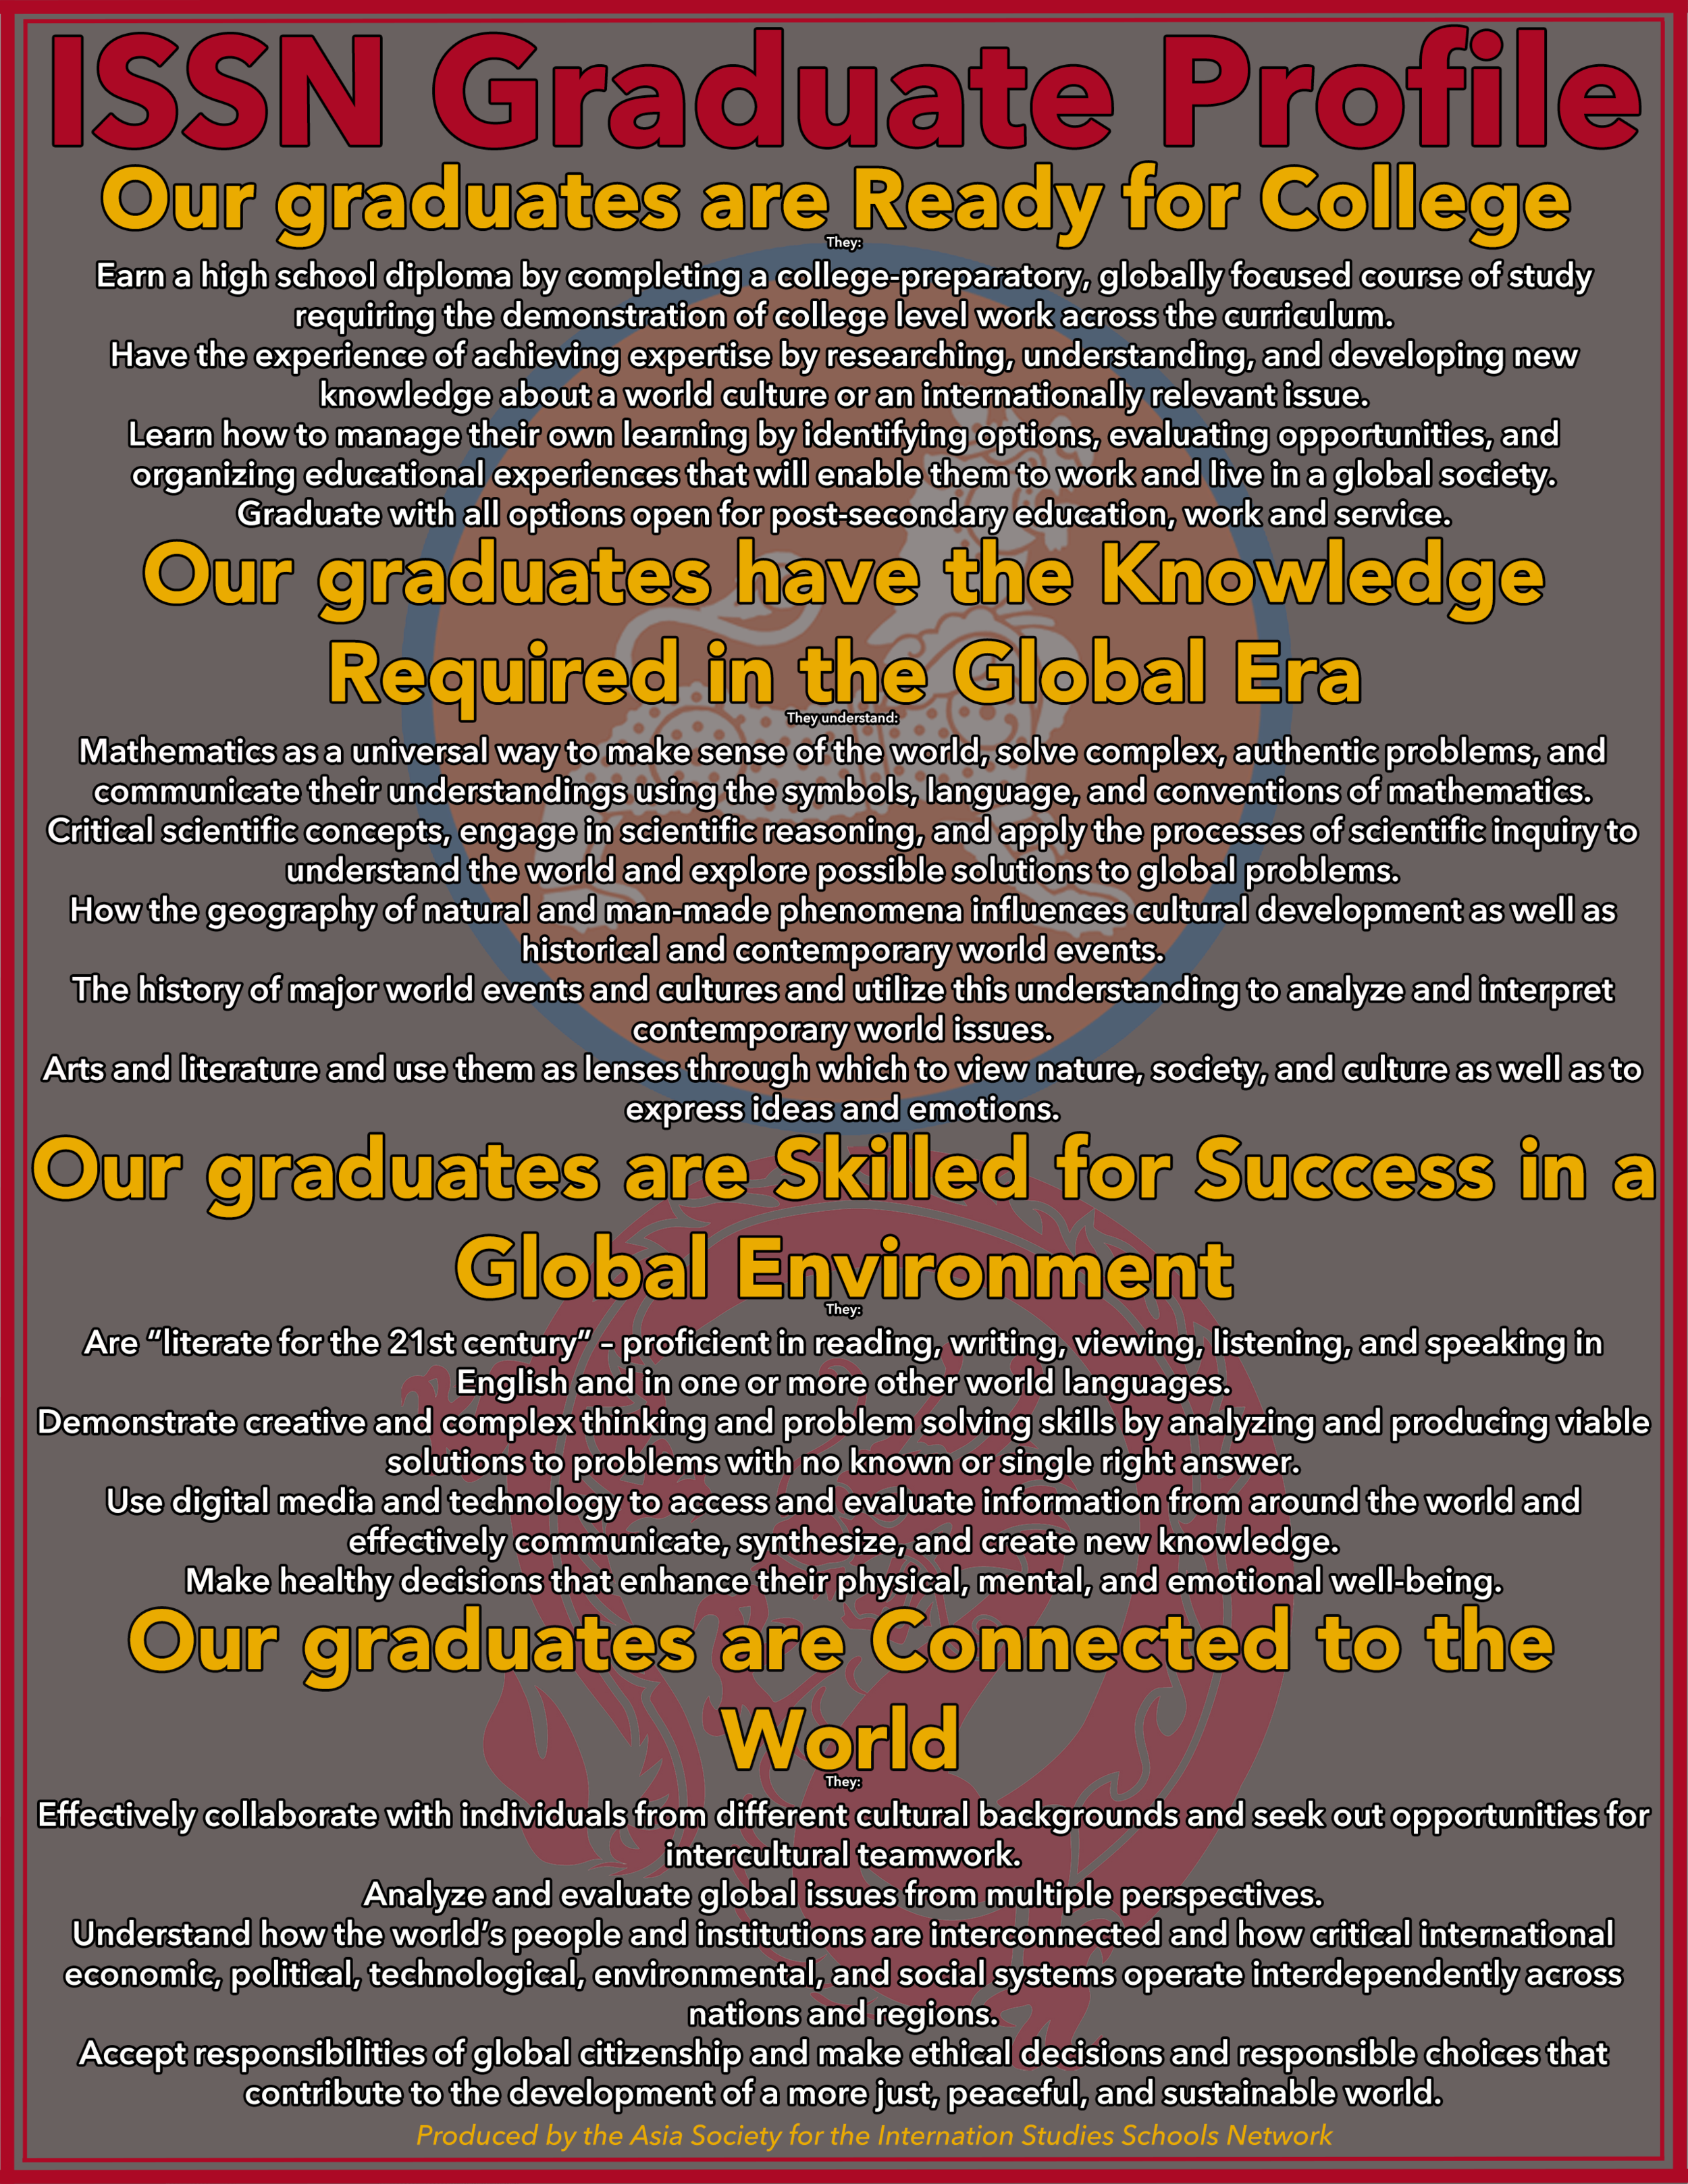 Graduate Profile.png